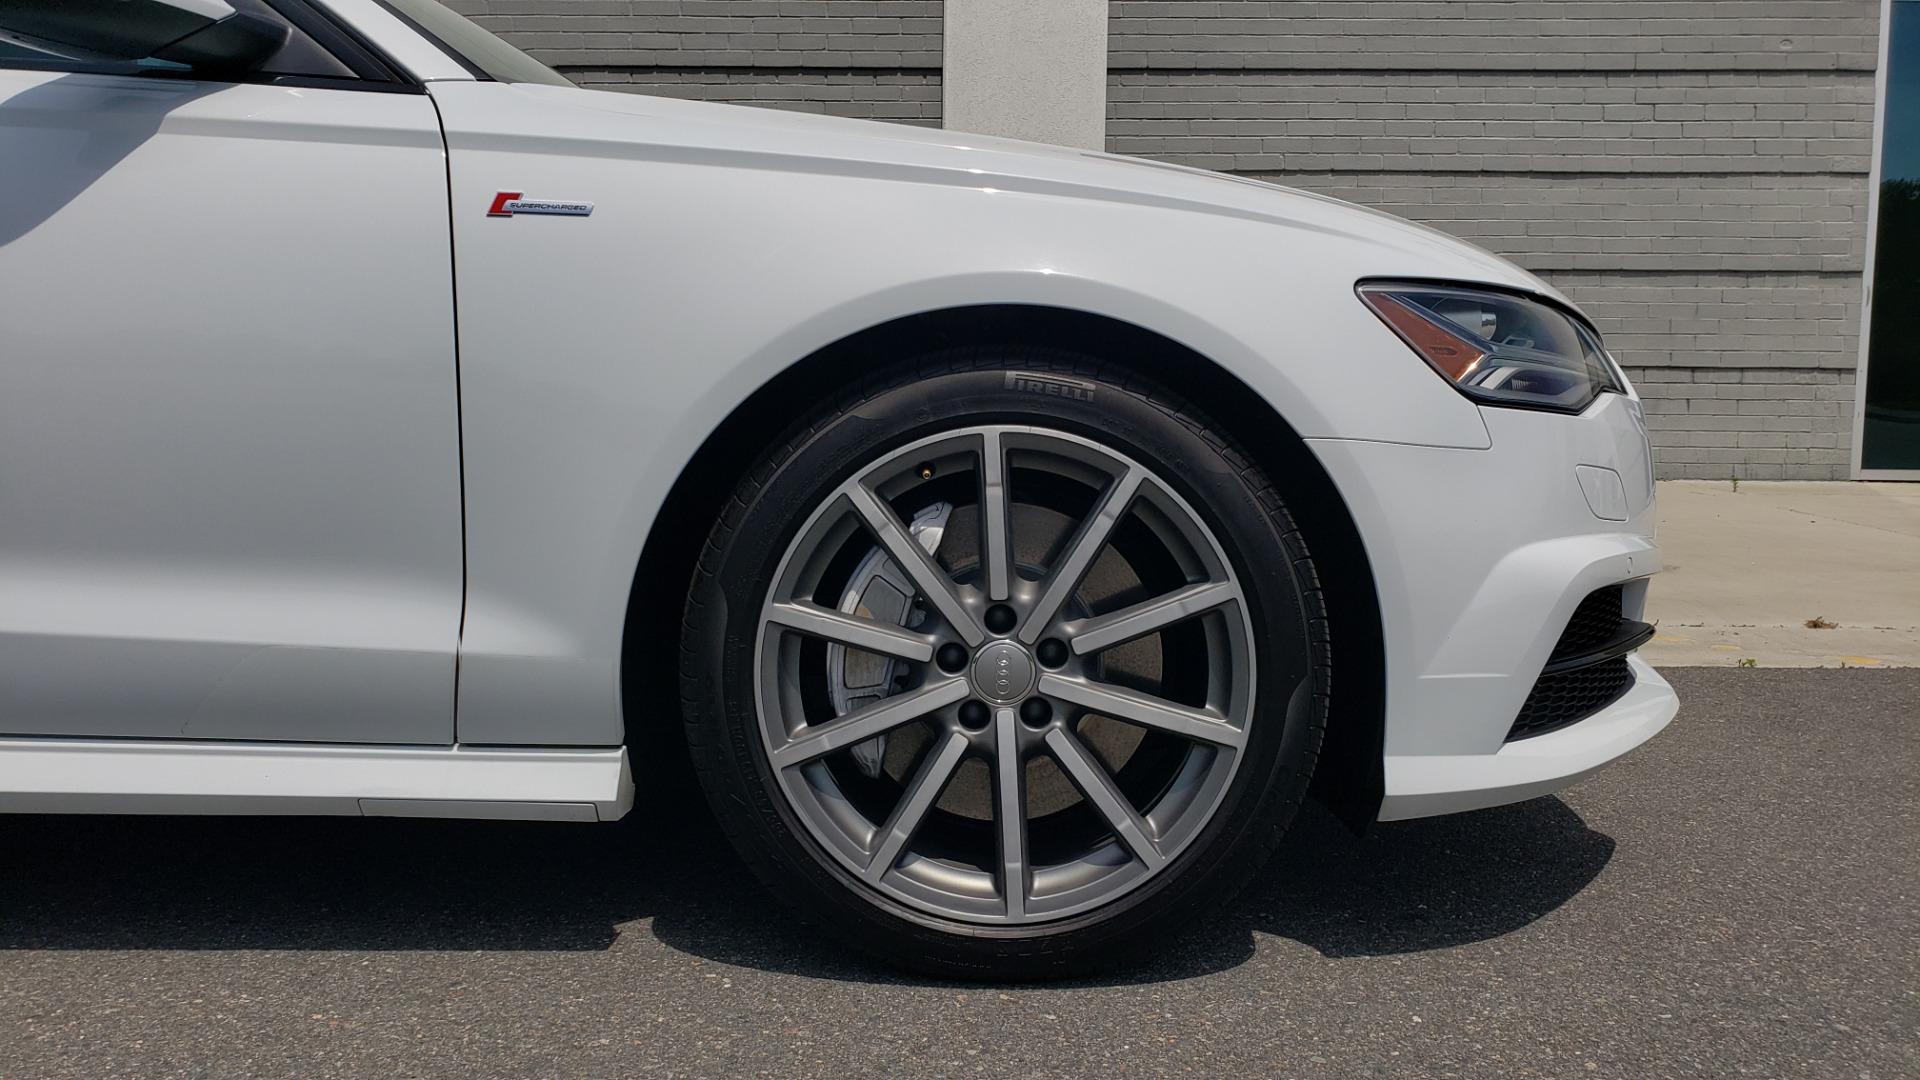 Used 2017 Audi A6 PRESTIGE SEDAN 3.0T / NAV / SUNROOF / BLACK OPTIC / CLD WTHR / REARVIEW for sale $30,797 at Formula Imports in Charlotte NC 28227 85